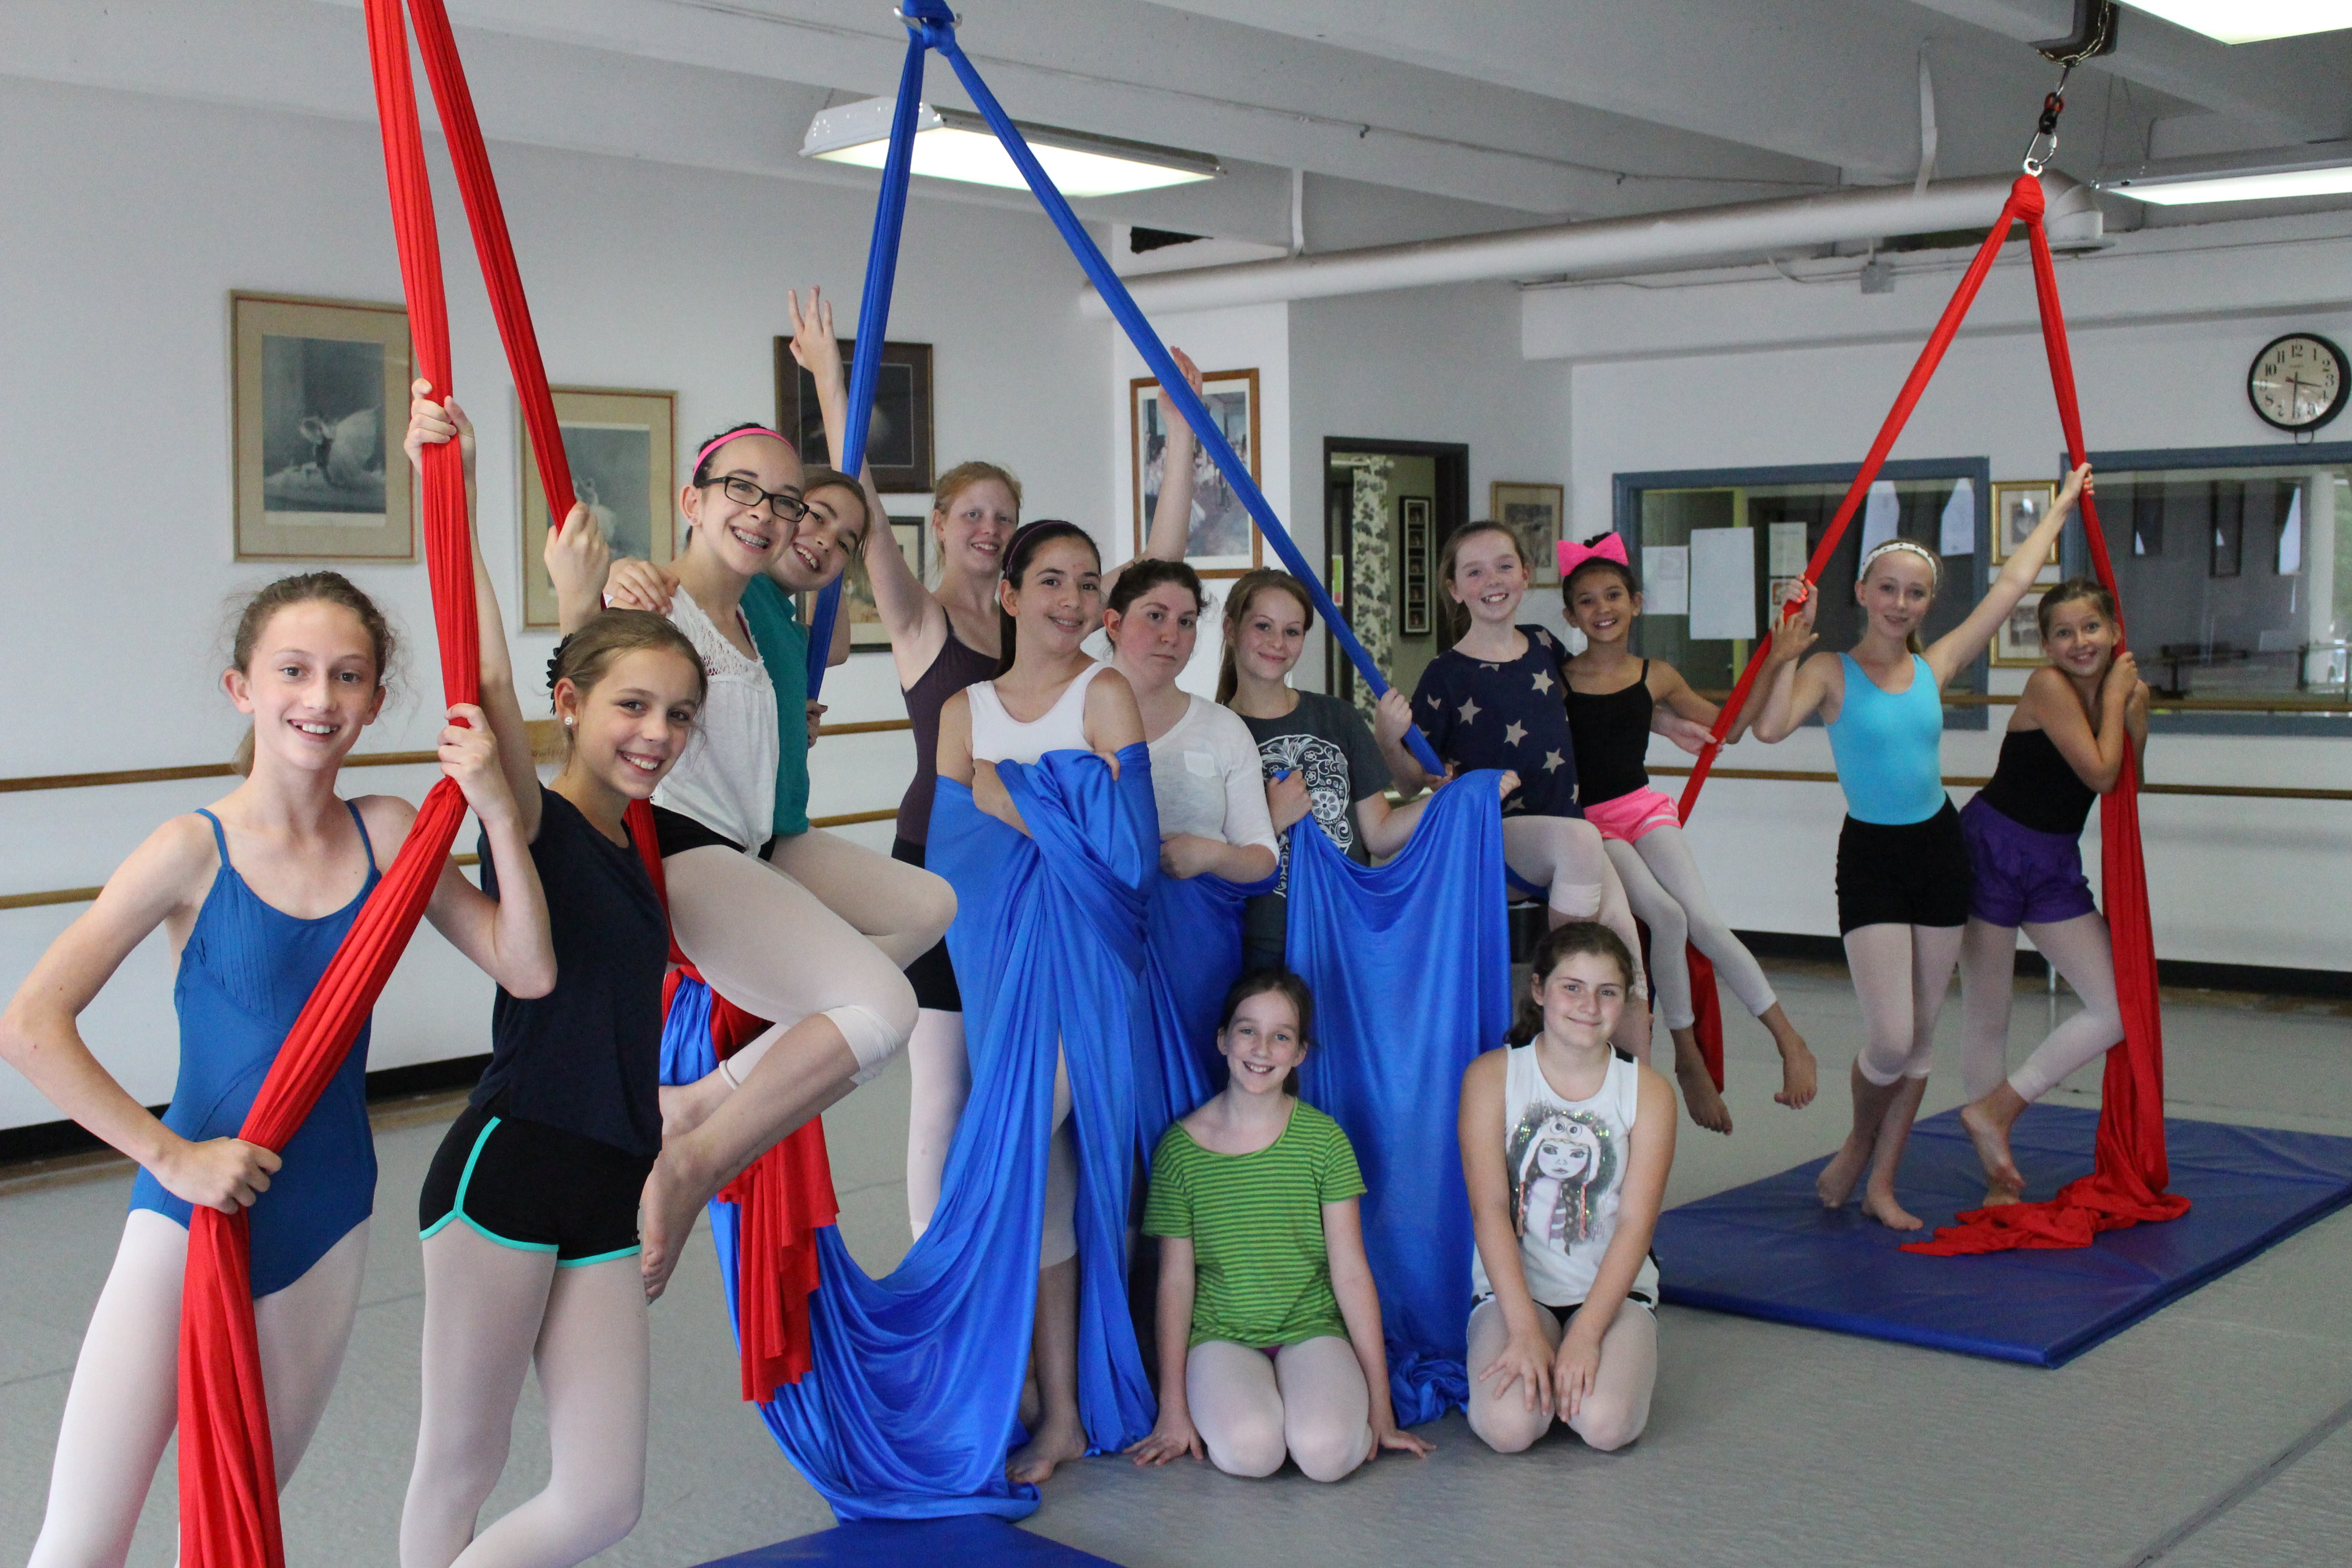 Longmont Dance Studios | longmont rec center classes